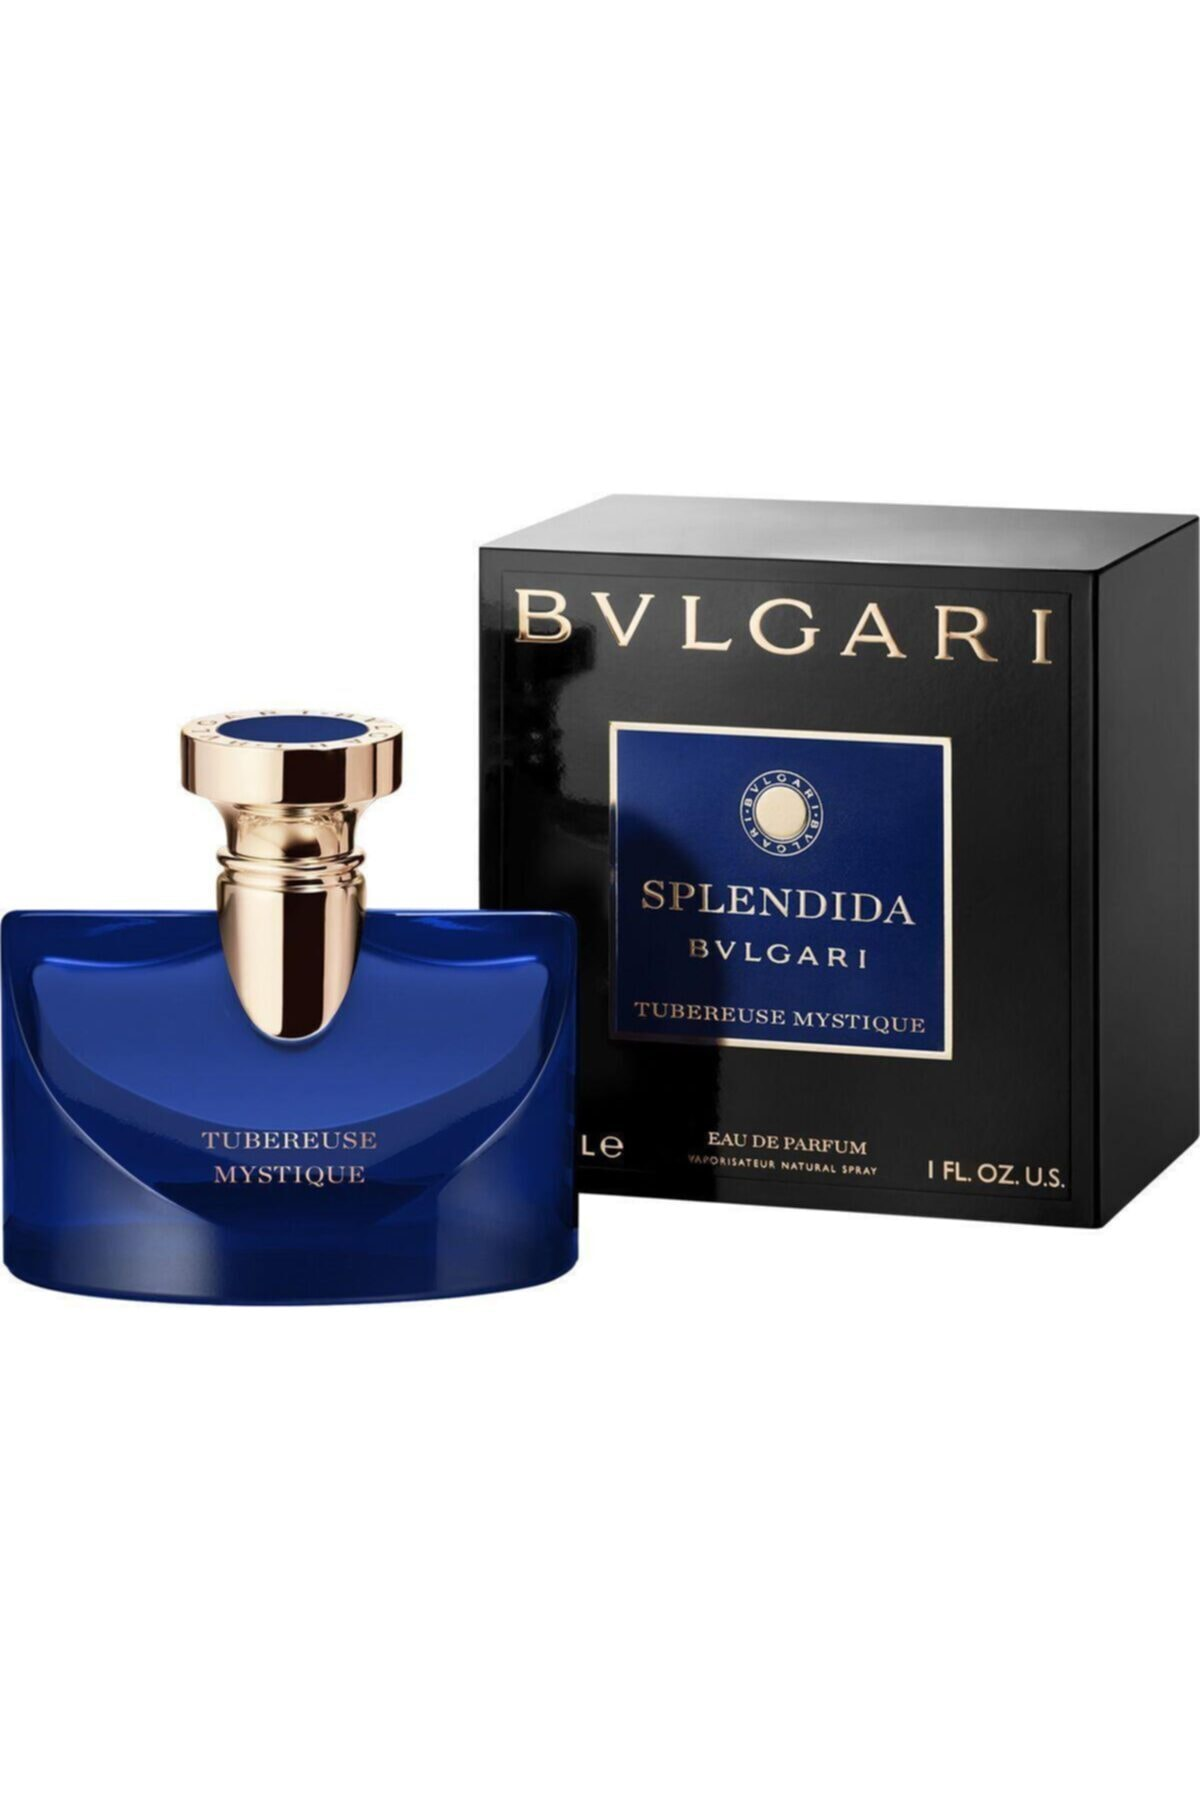 Bvlgari Splendida Tubereuse Mystique Edp 50 ml Kadın Parfüm 783320409585 1